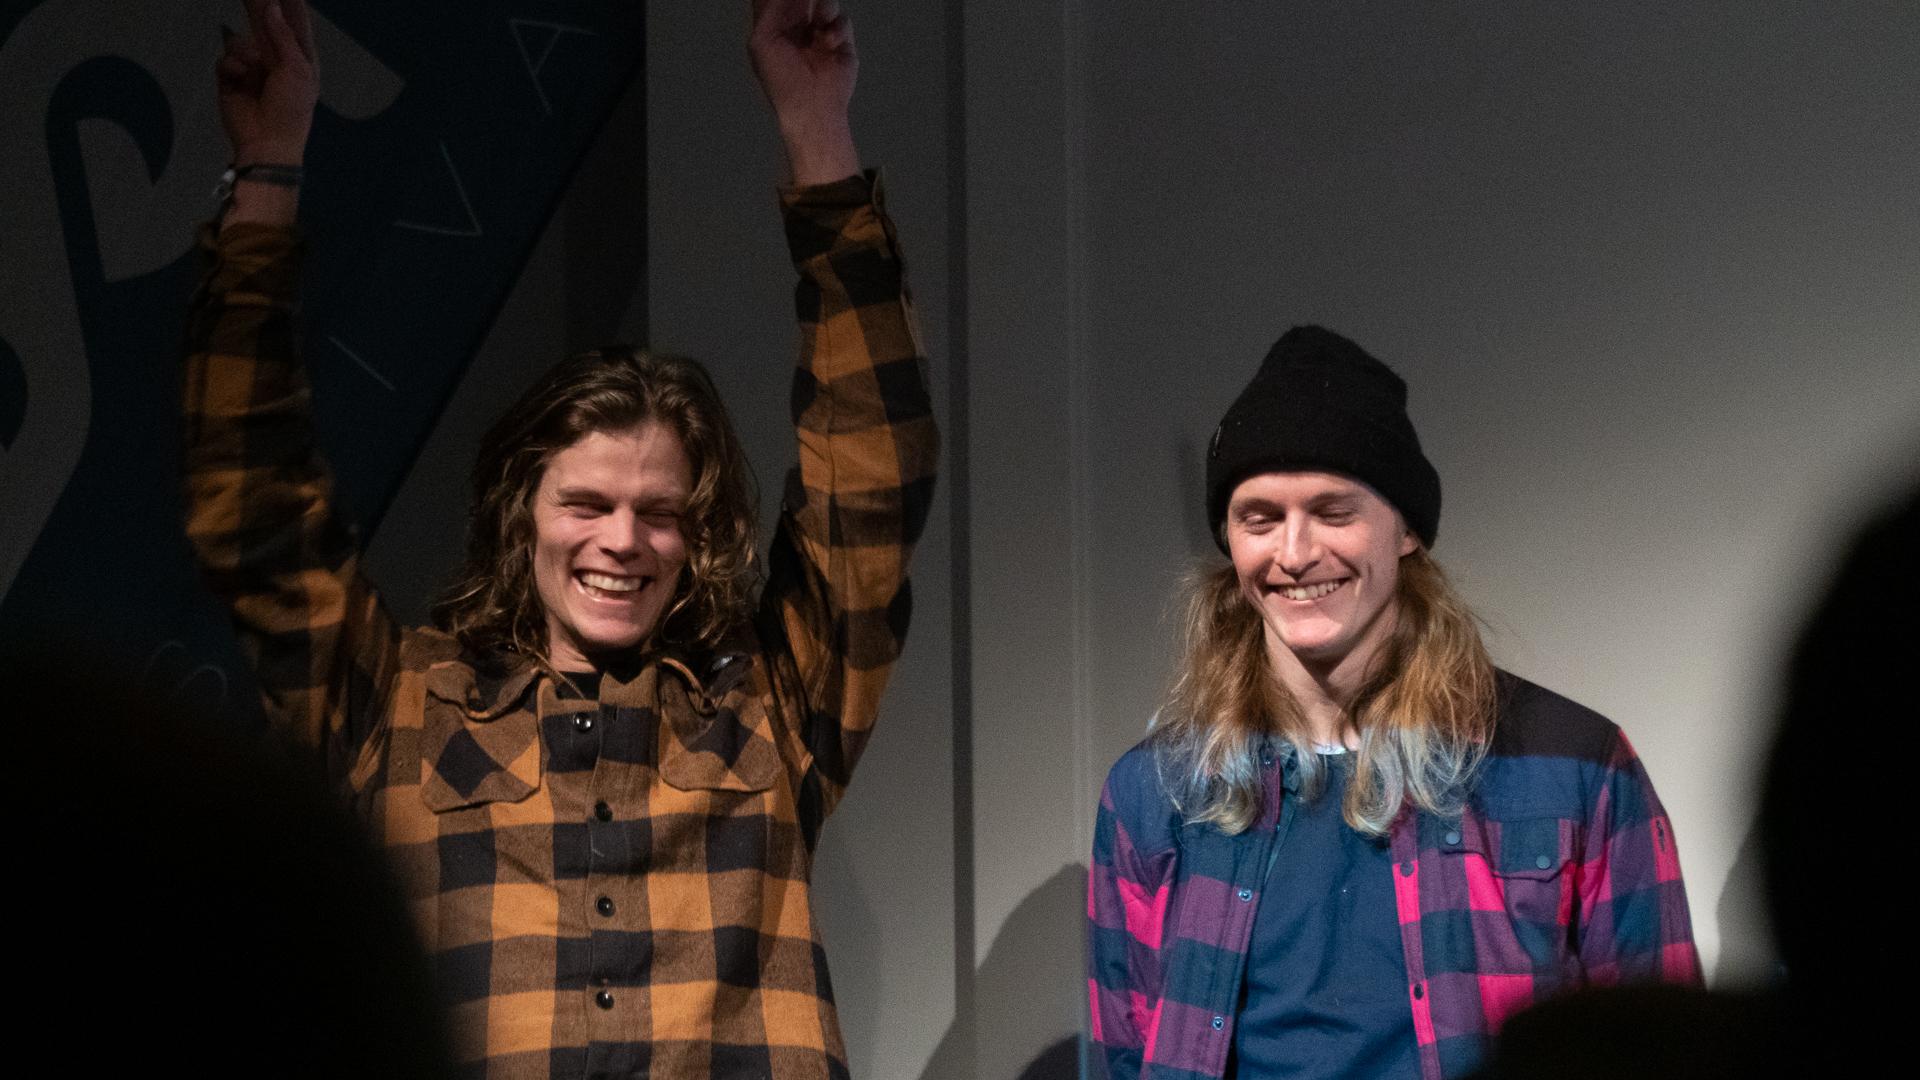 Torgeir Sørmo Holmslet - Fjellsportkveld (lørdag)-2.jpg